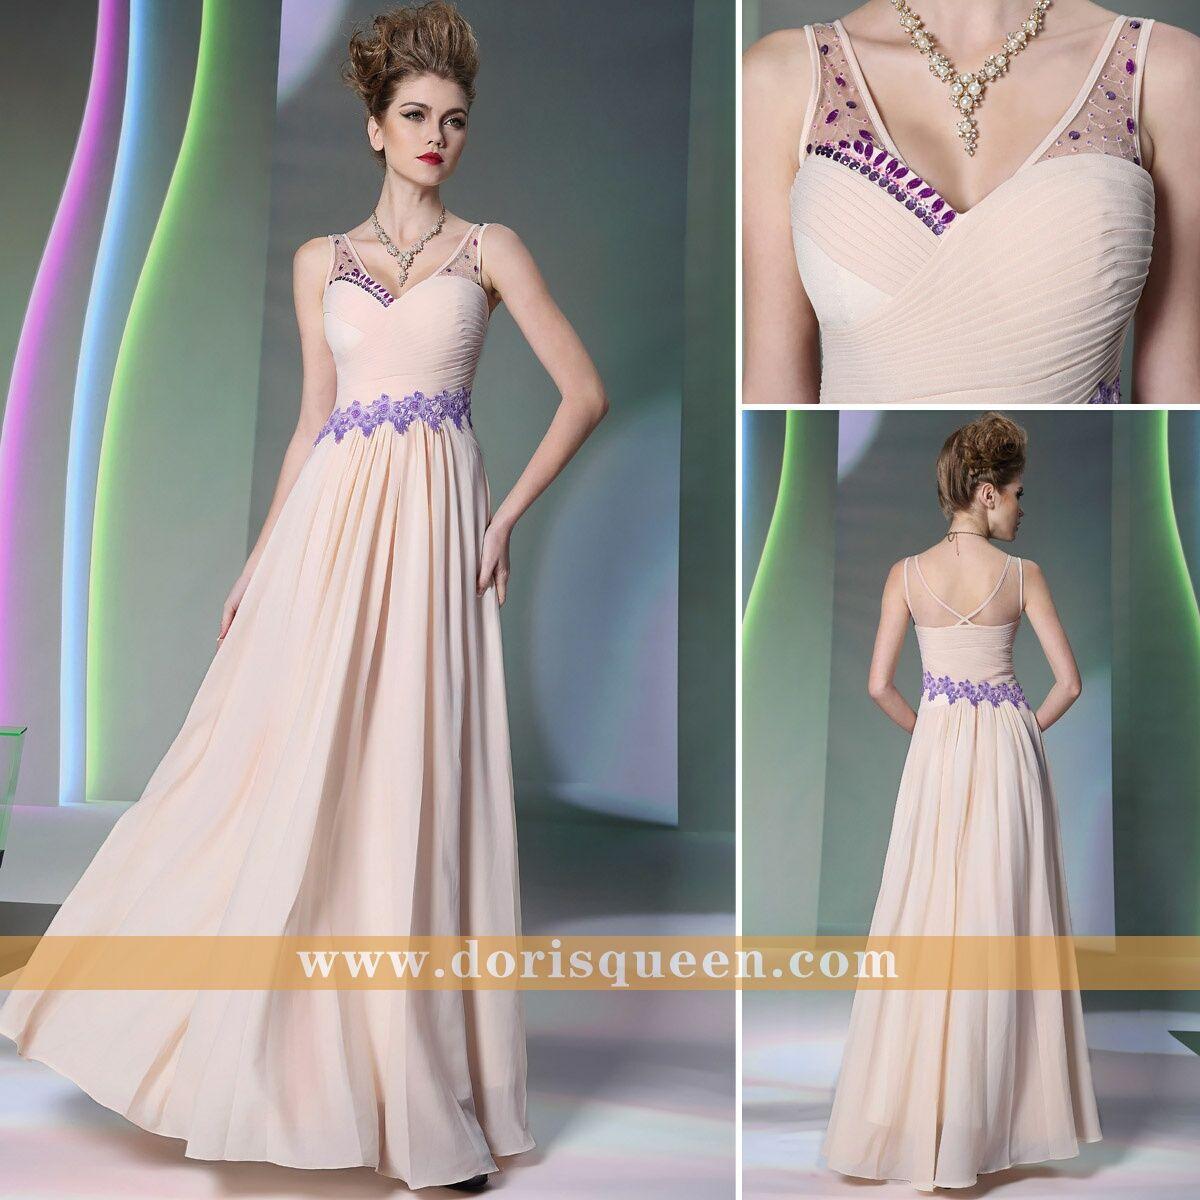 Long dresses for wedding party  light pink fashion prom dresses  elegant long bridesmaid